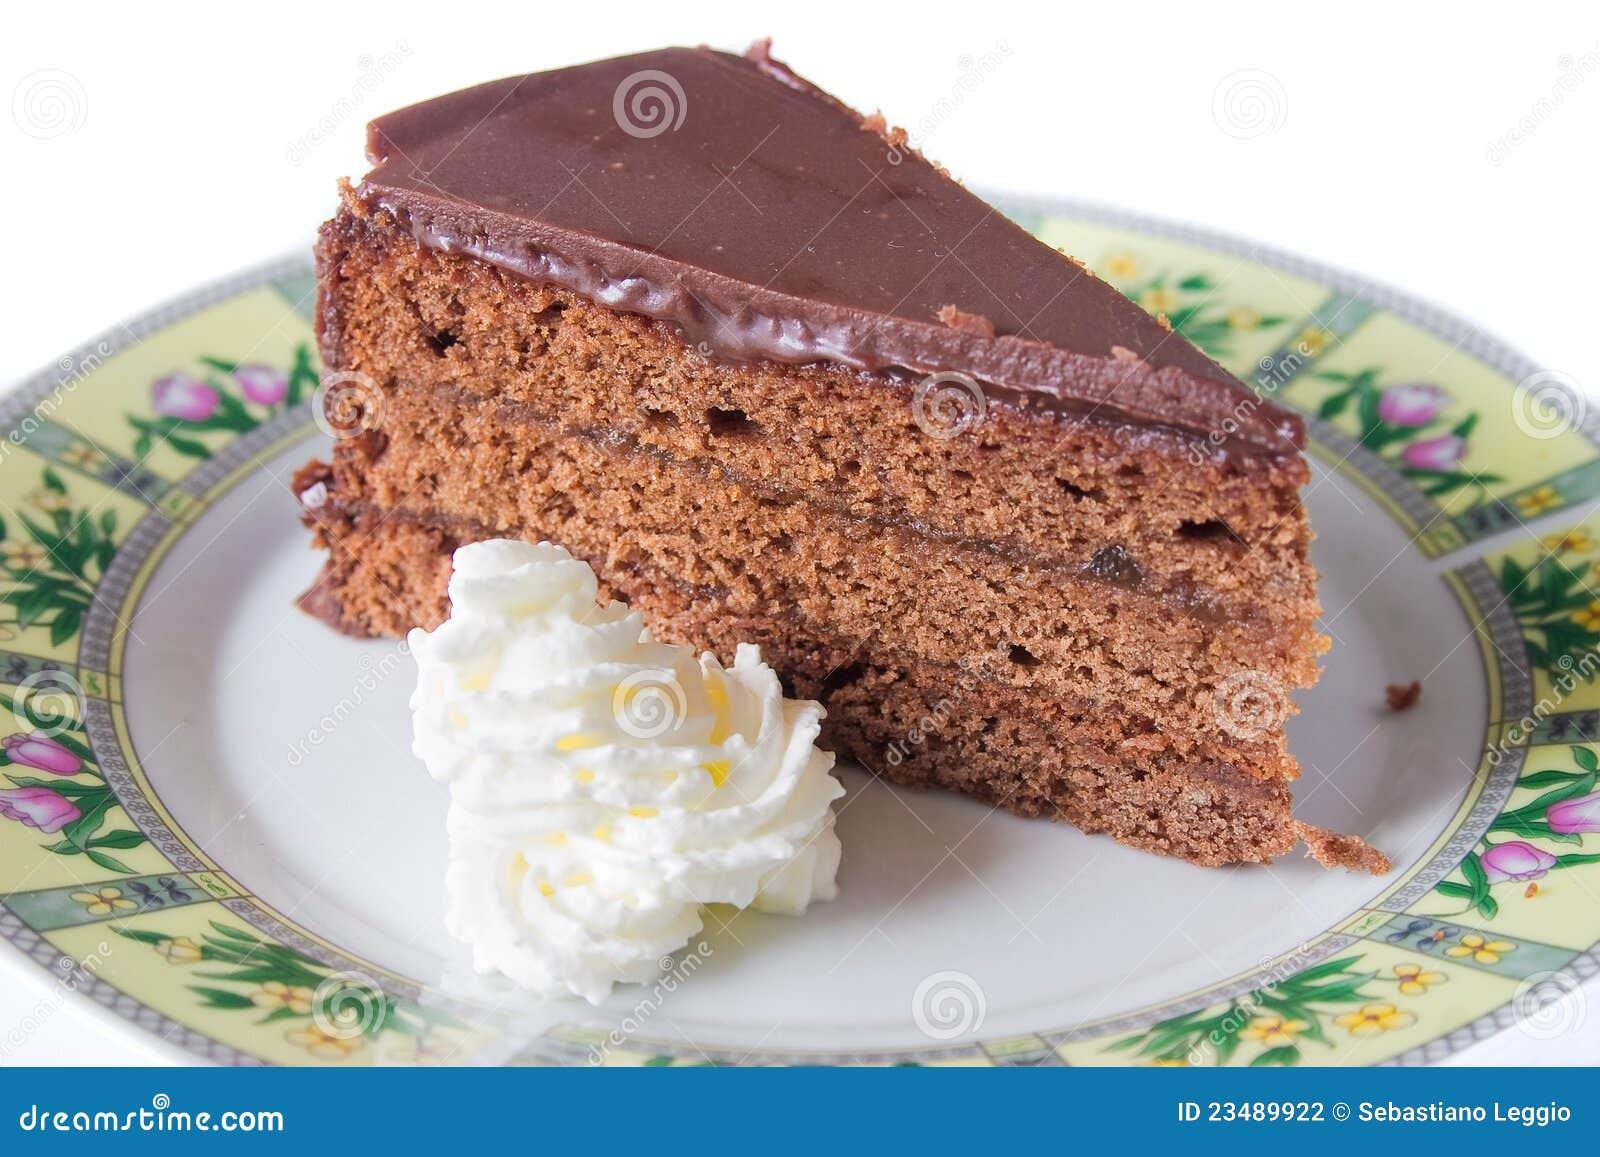 Make Chocolate Sacher Cake